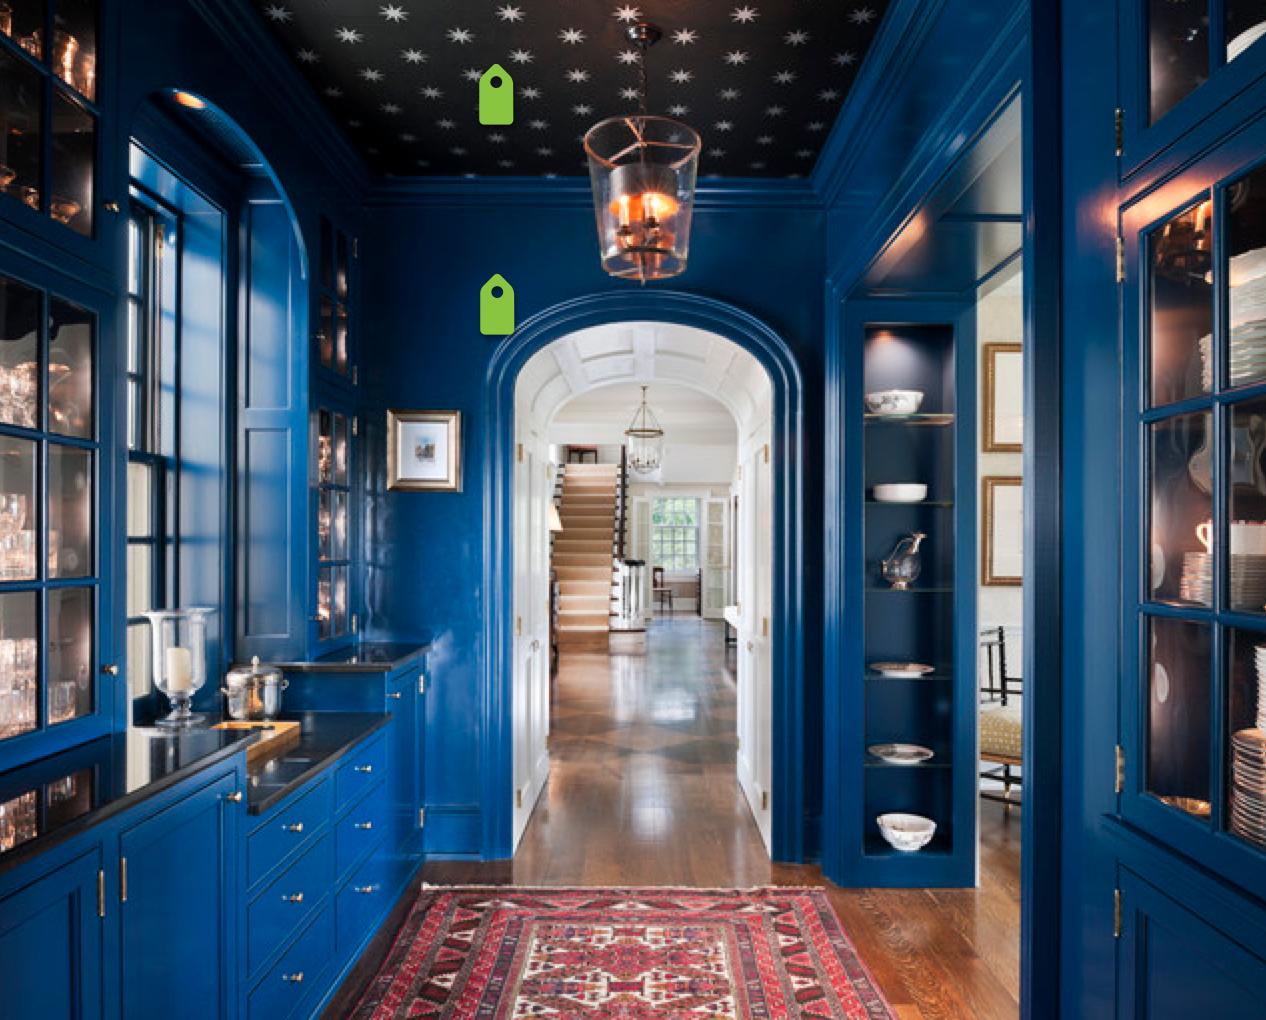 Sleek cobalt blue. Draws you in.